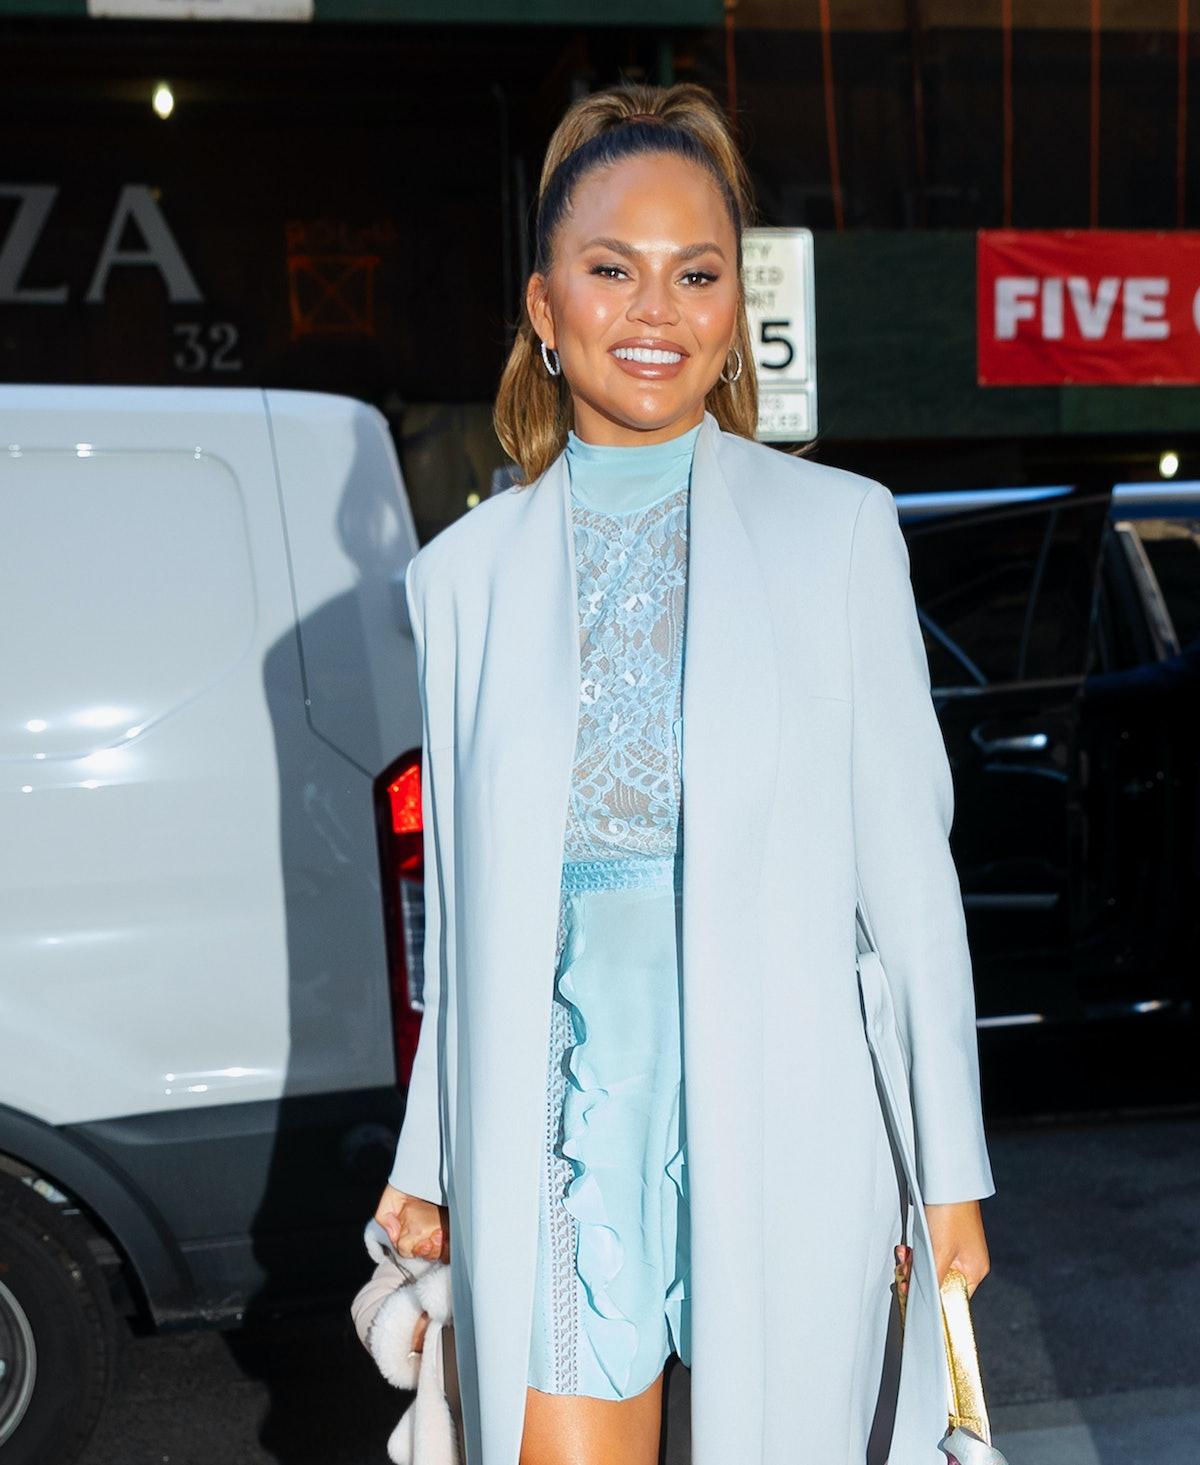 NEW YORK, NEW YORK - FEBRUARY 19: Chrissy Teigen arrives at NBC studios with daughter Luna on Februa...